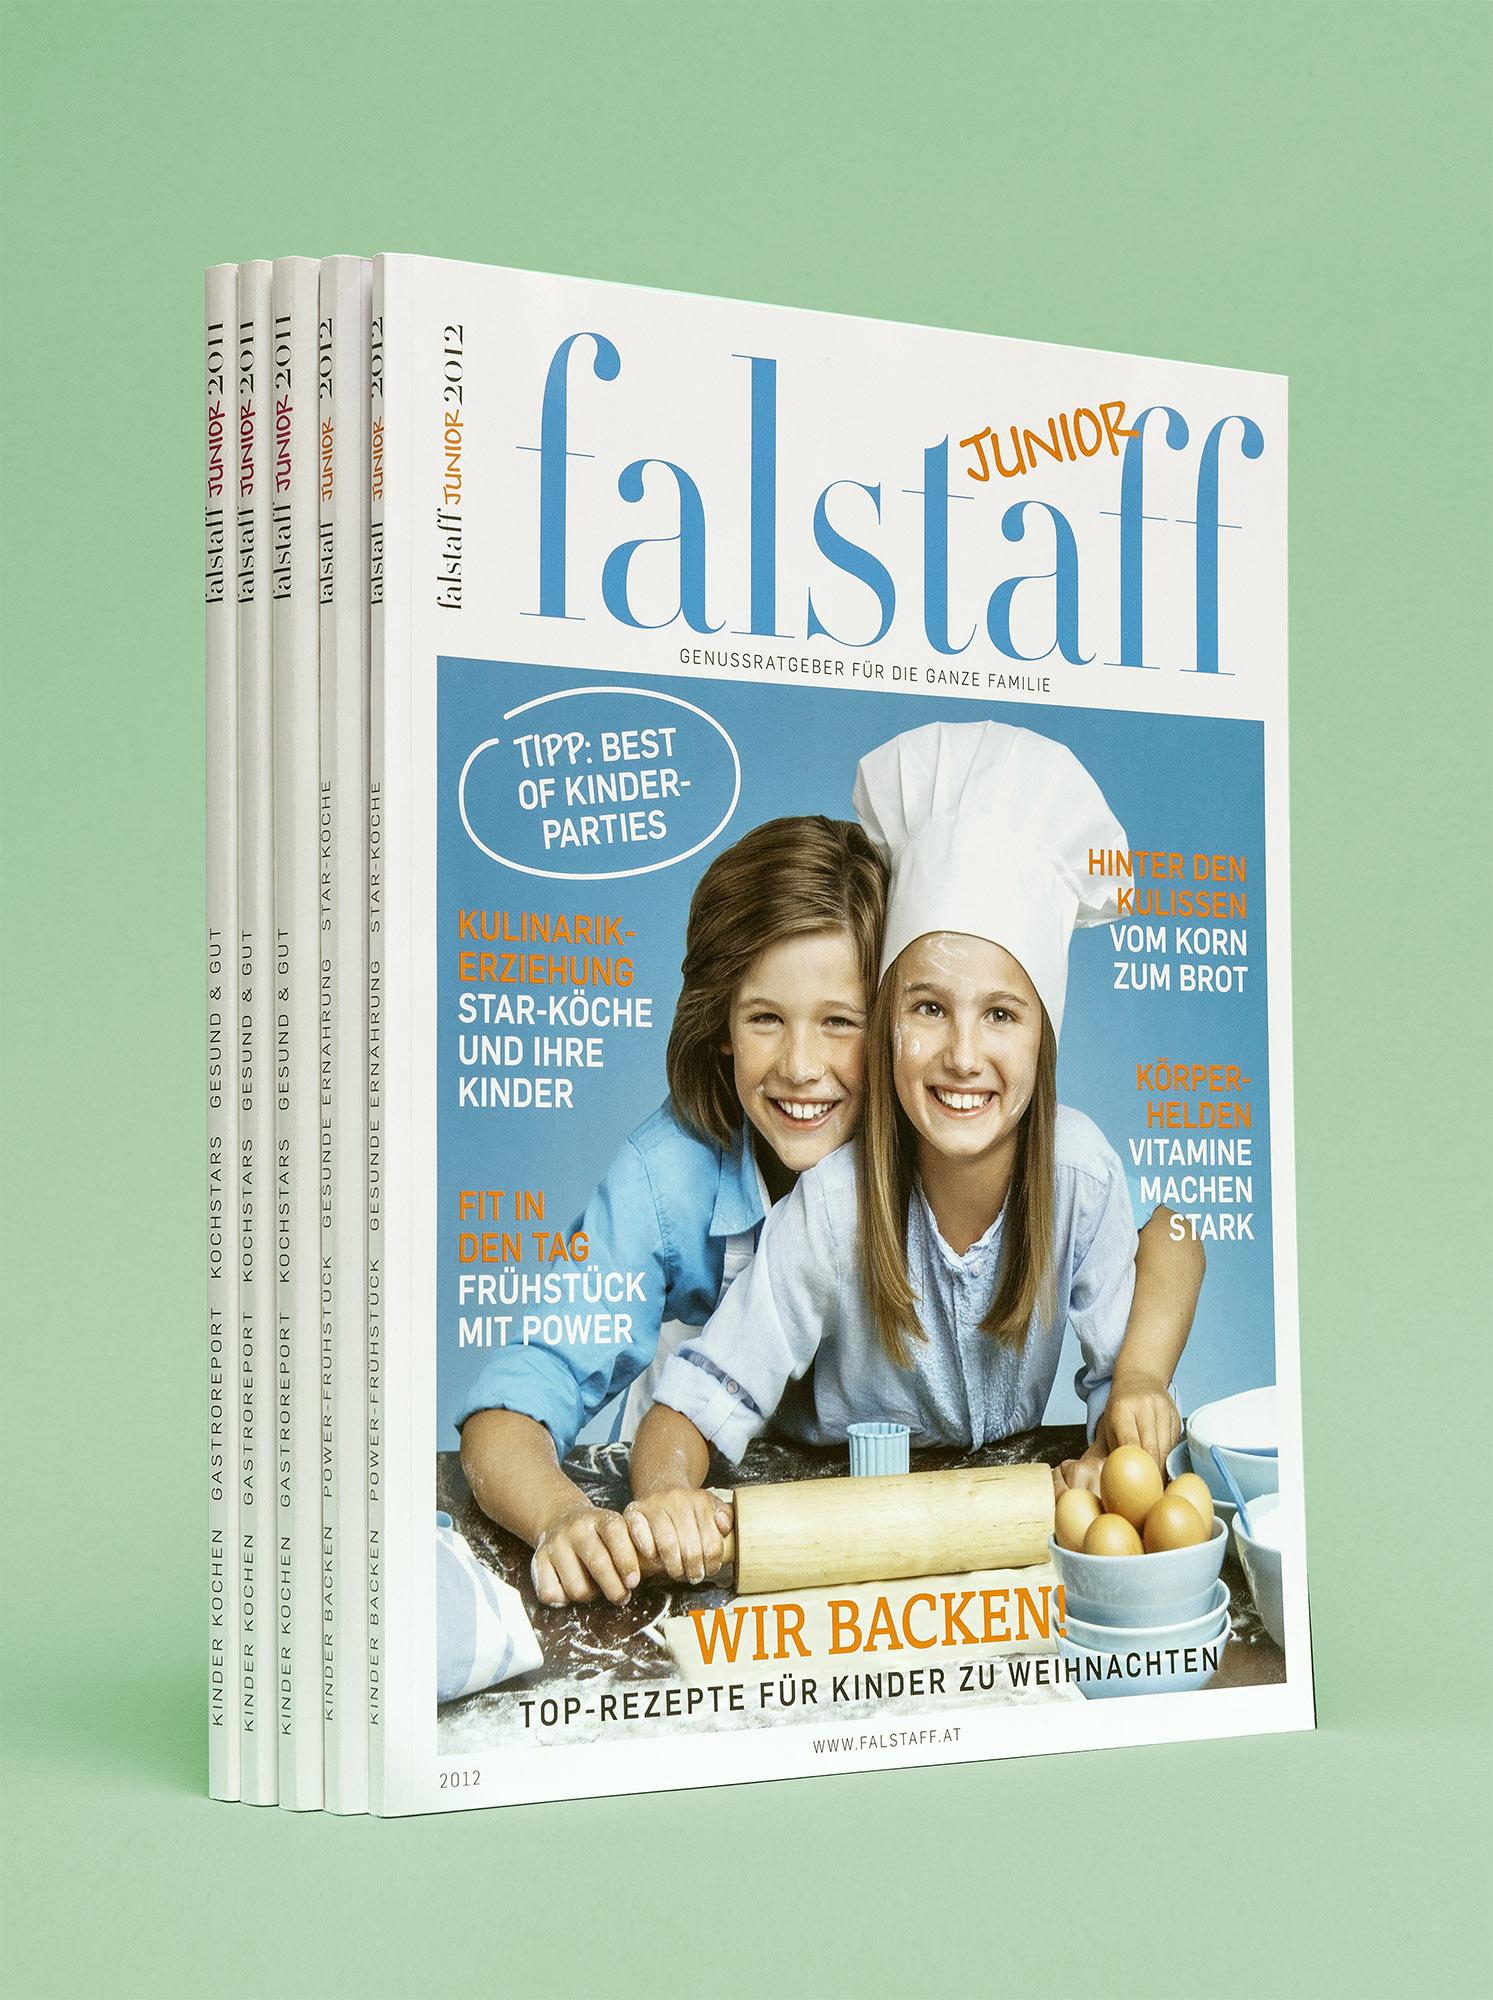 Grafikdesign Agentur Viktoria Platzer Editorial Design Falstaff2